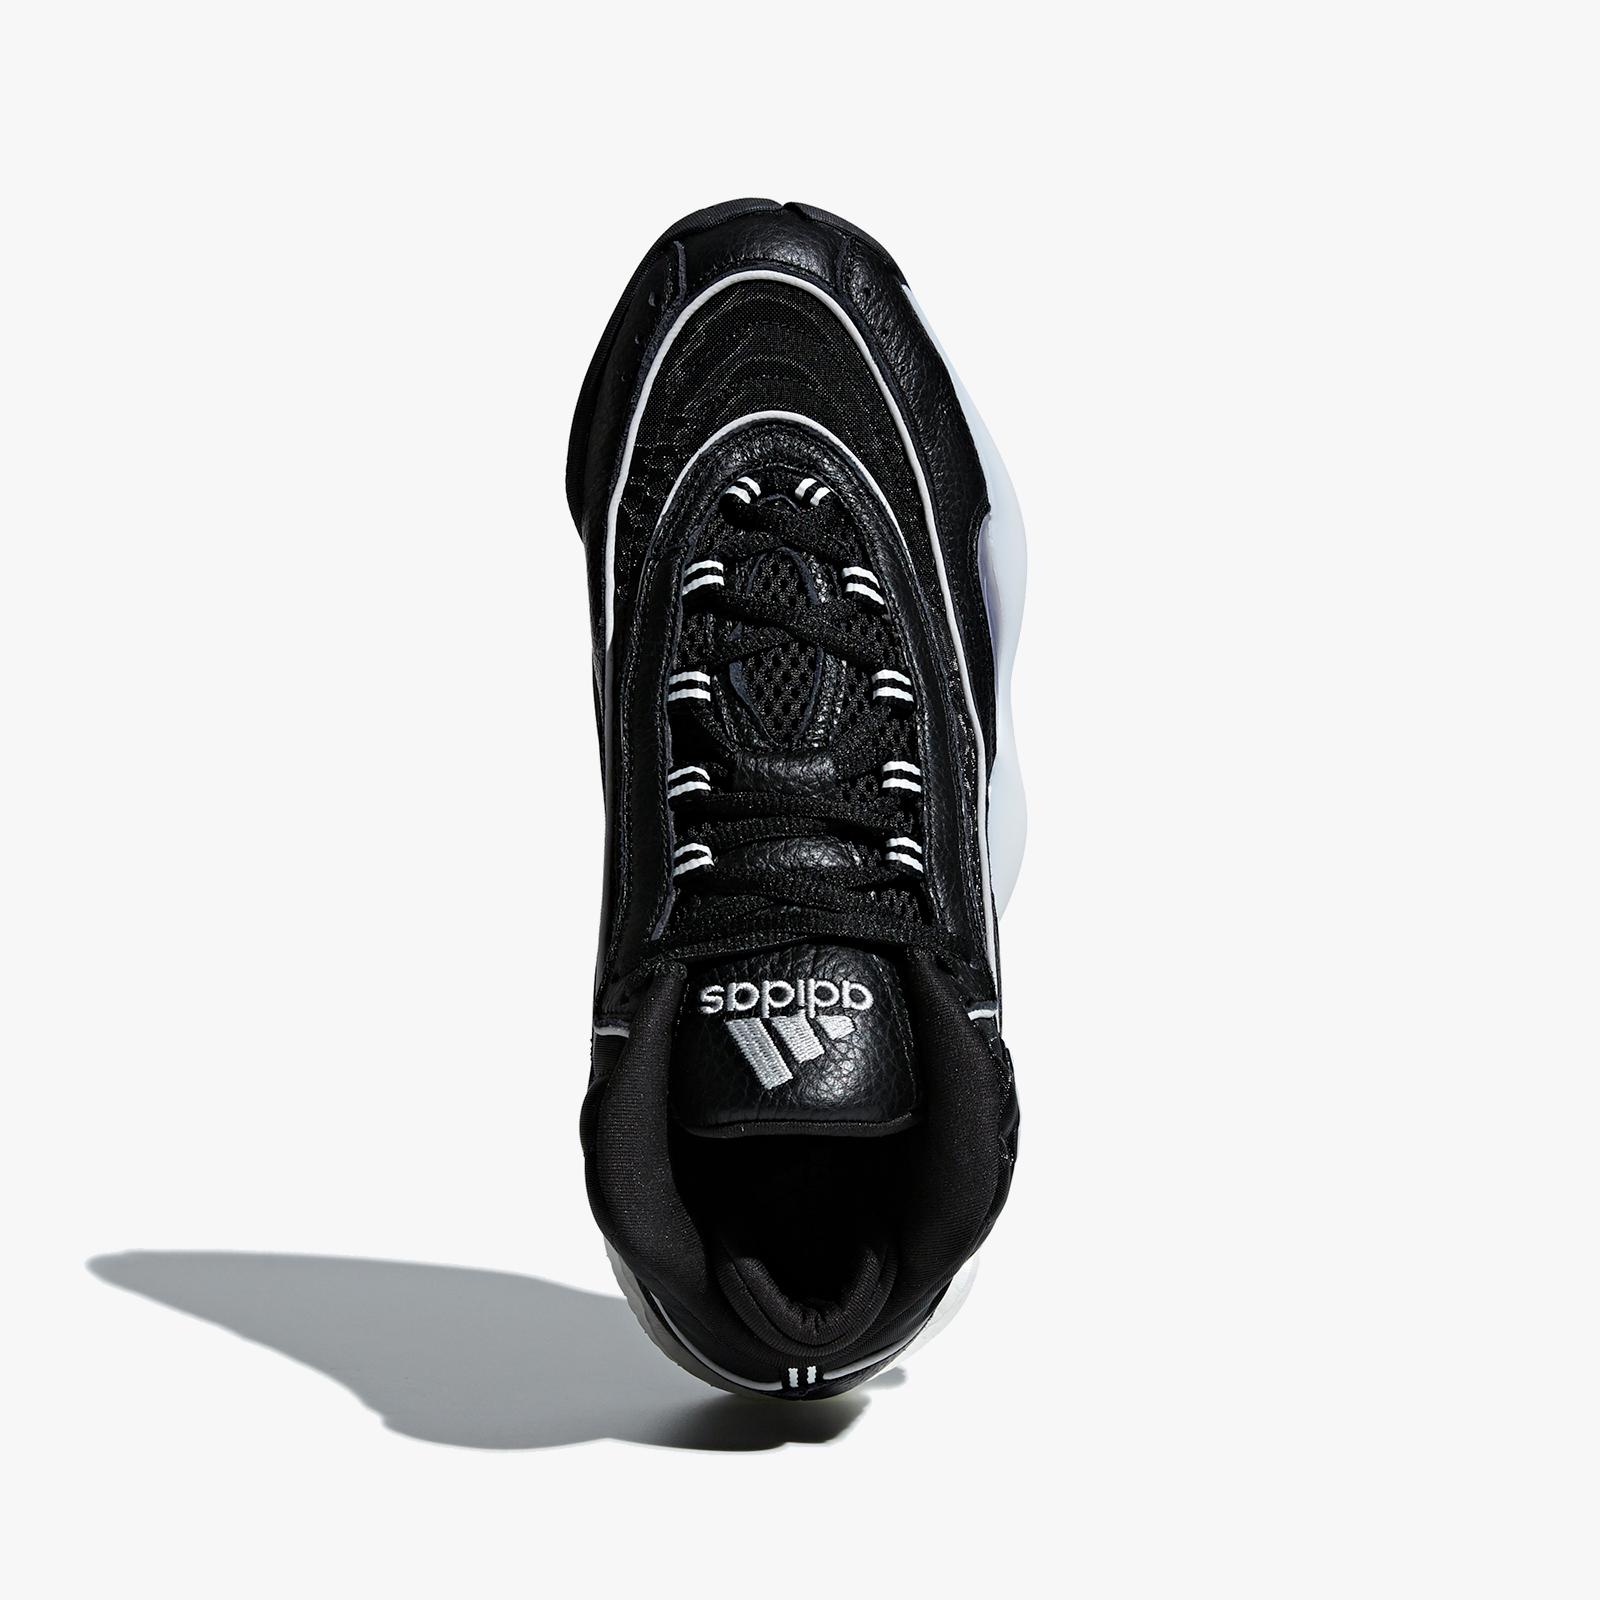 finest selection 24745 689a9 ... adidas Originals FYW x BYW ...